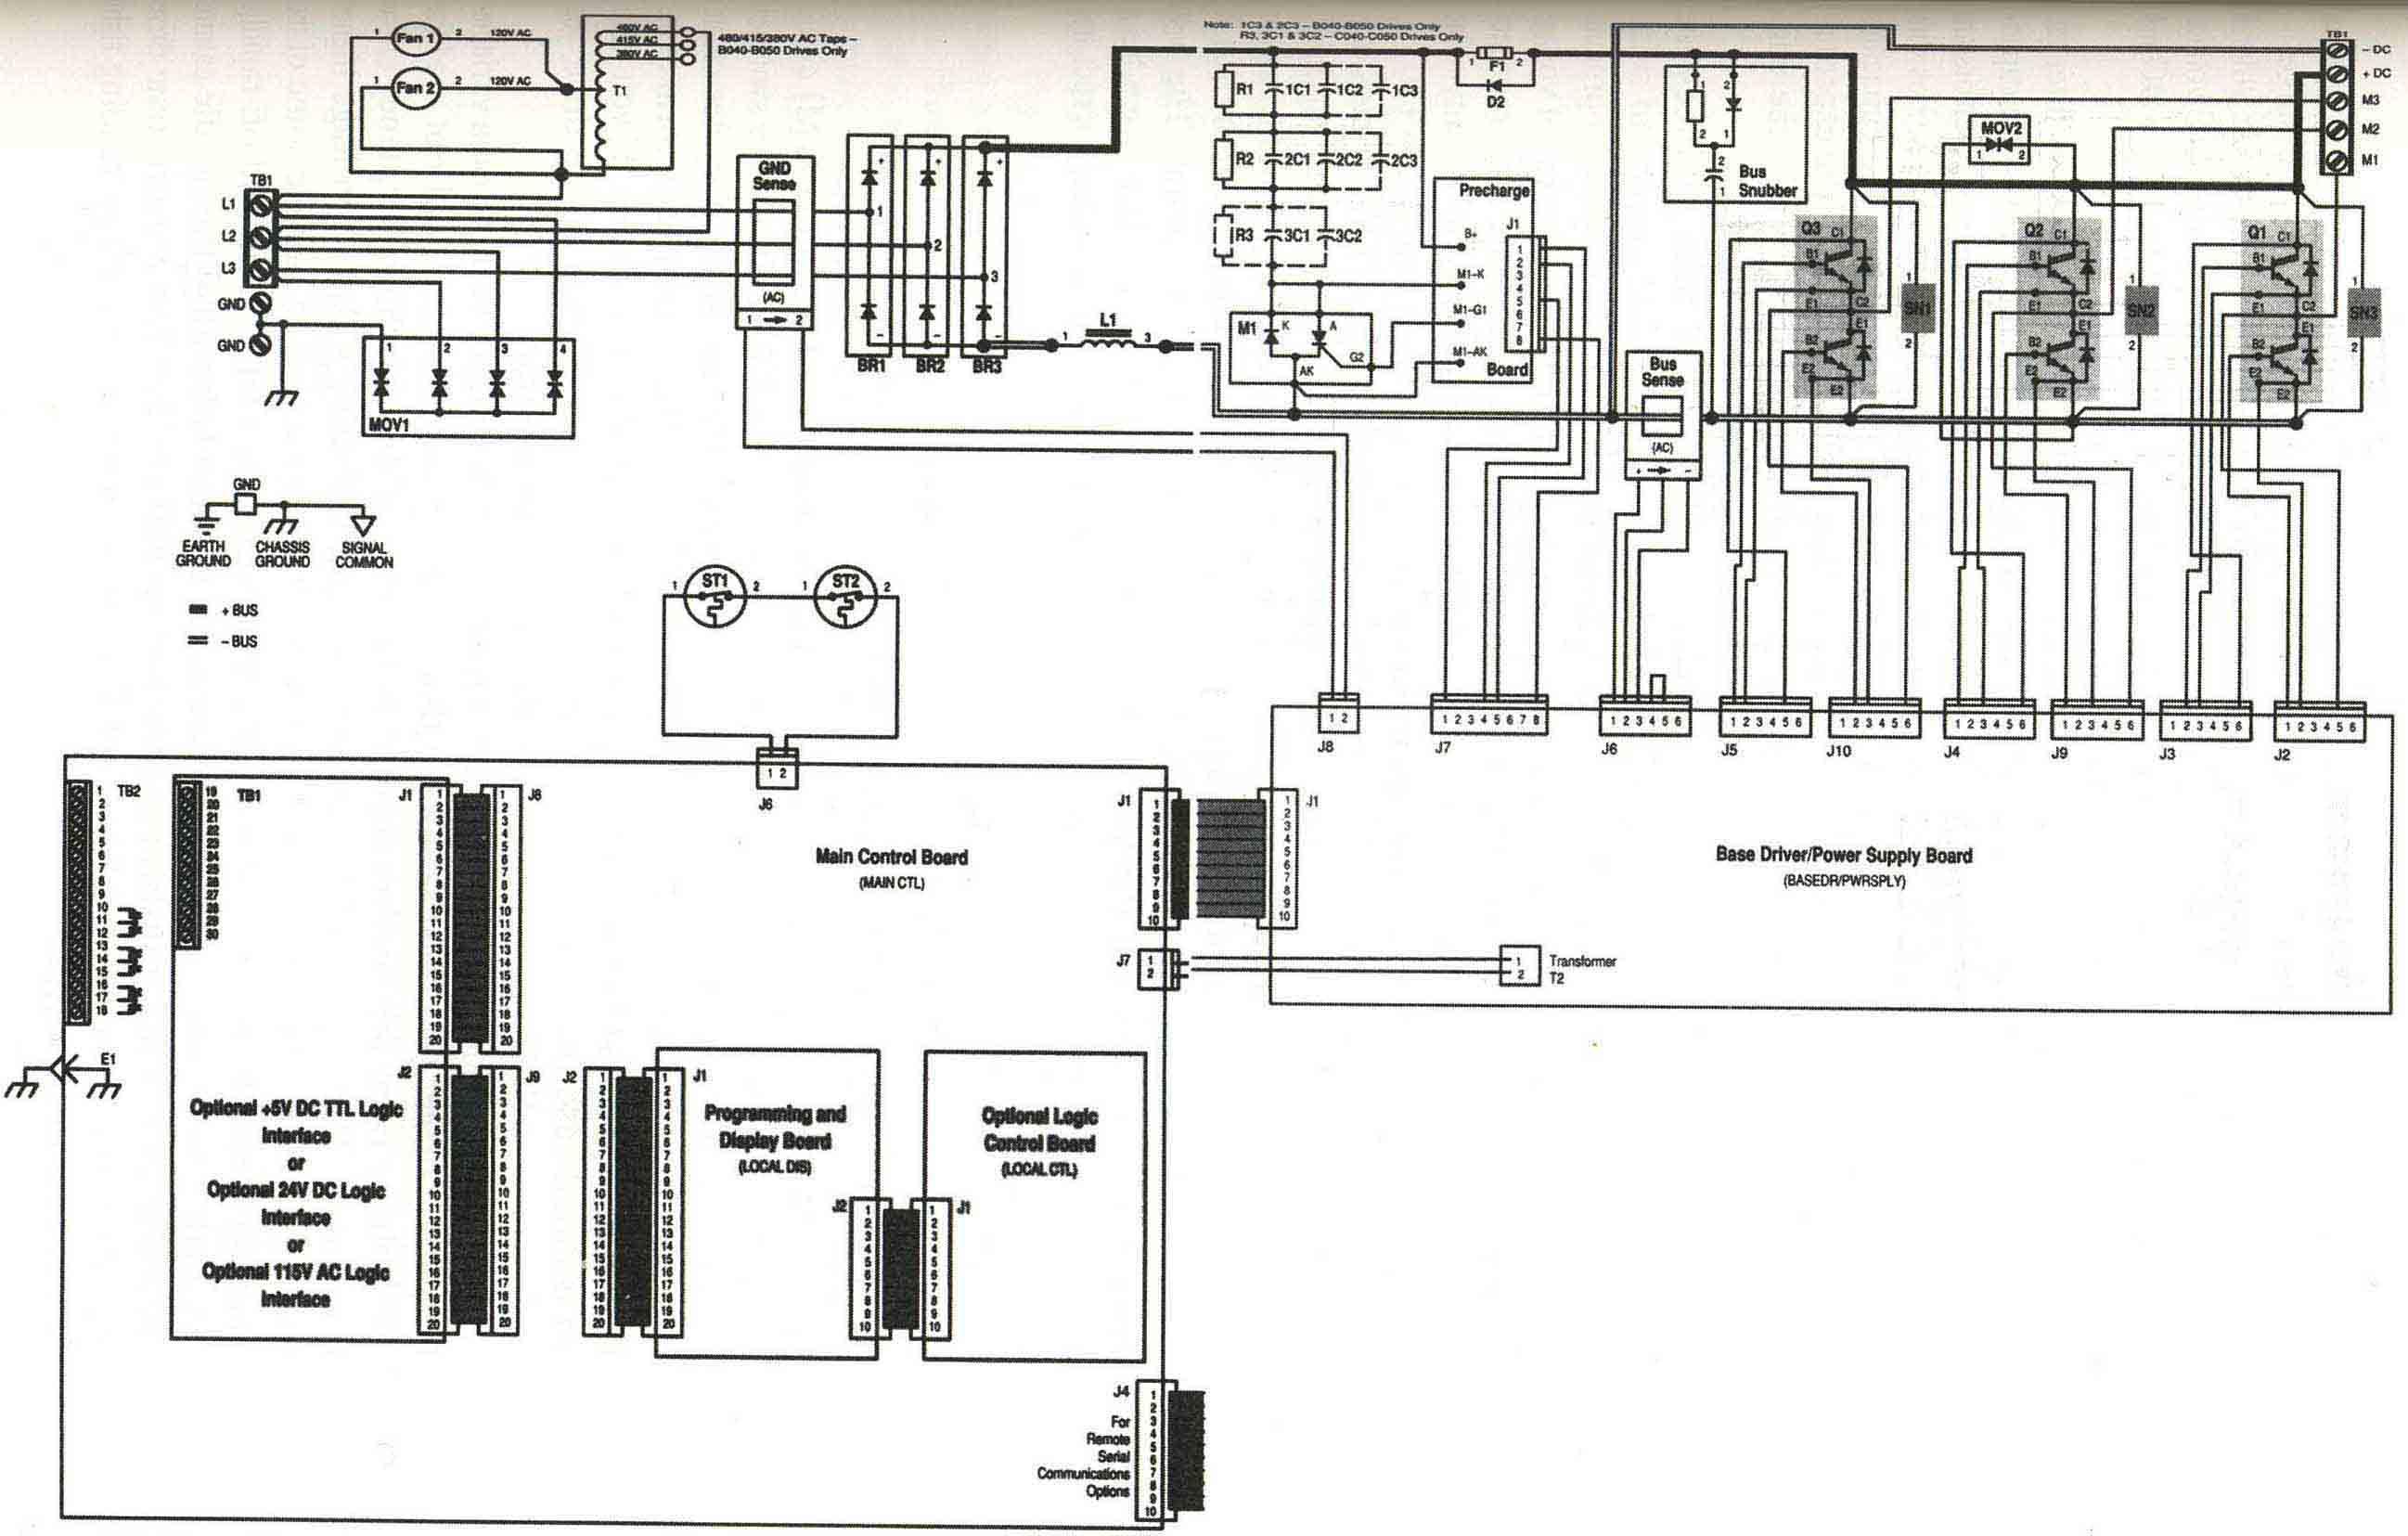 port a cool evaporator3600 wiring diagram simple wiring post rh 27 asiagourmet igb de Schematic Diagram Wiring Diagram Symbols